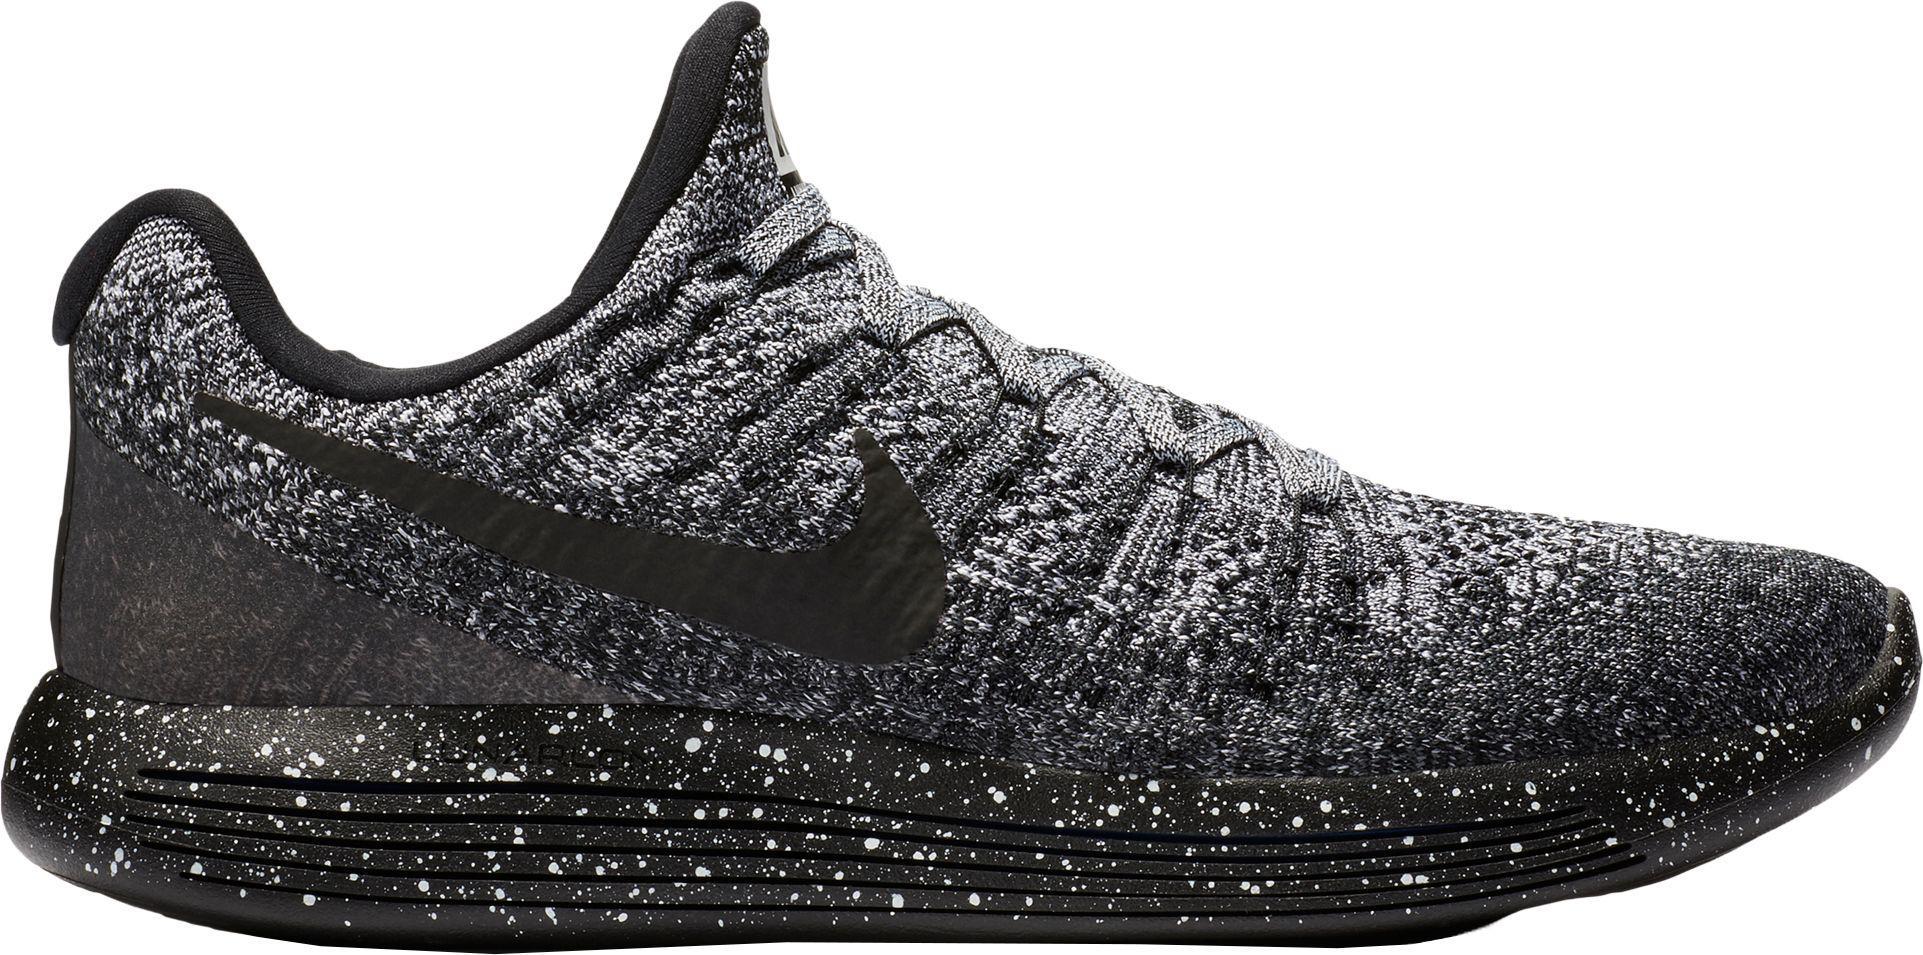 brand new 8f1c3 156dd Men's Black Lunarepic Low Flyknit 2 Running Shoes